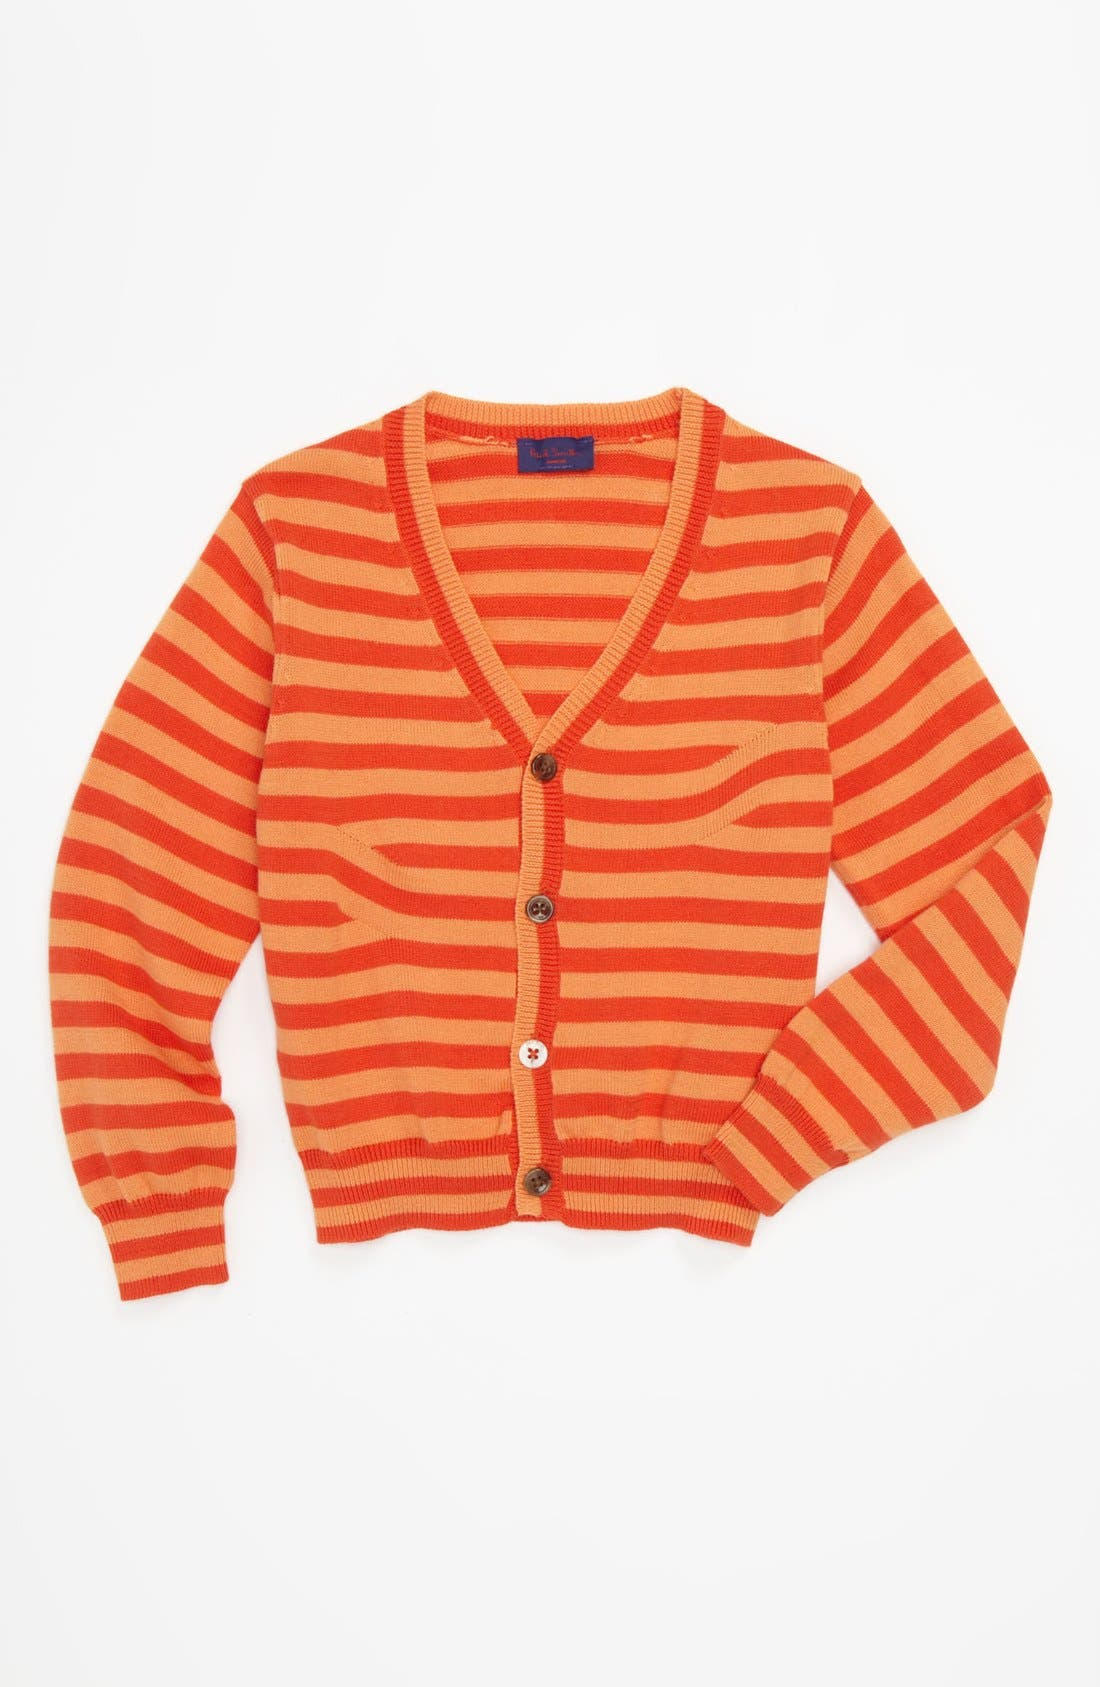 Alternate Image 1 Selected - Paul Smith Junior Stripe Cardigan (Toddler)